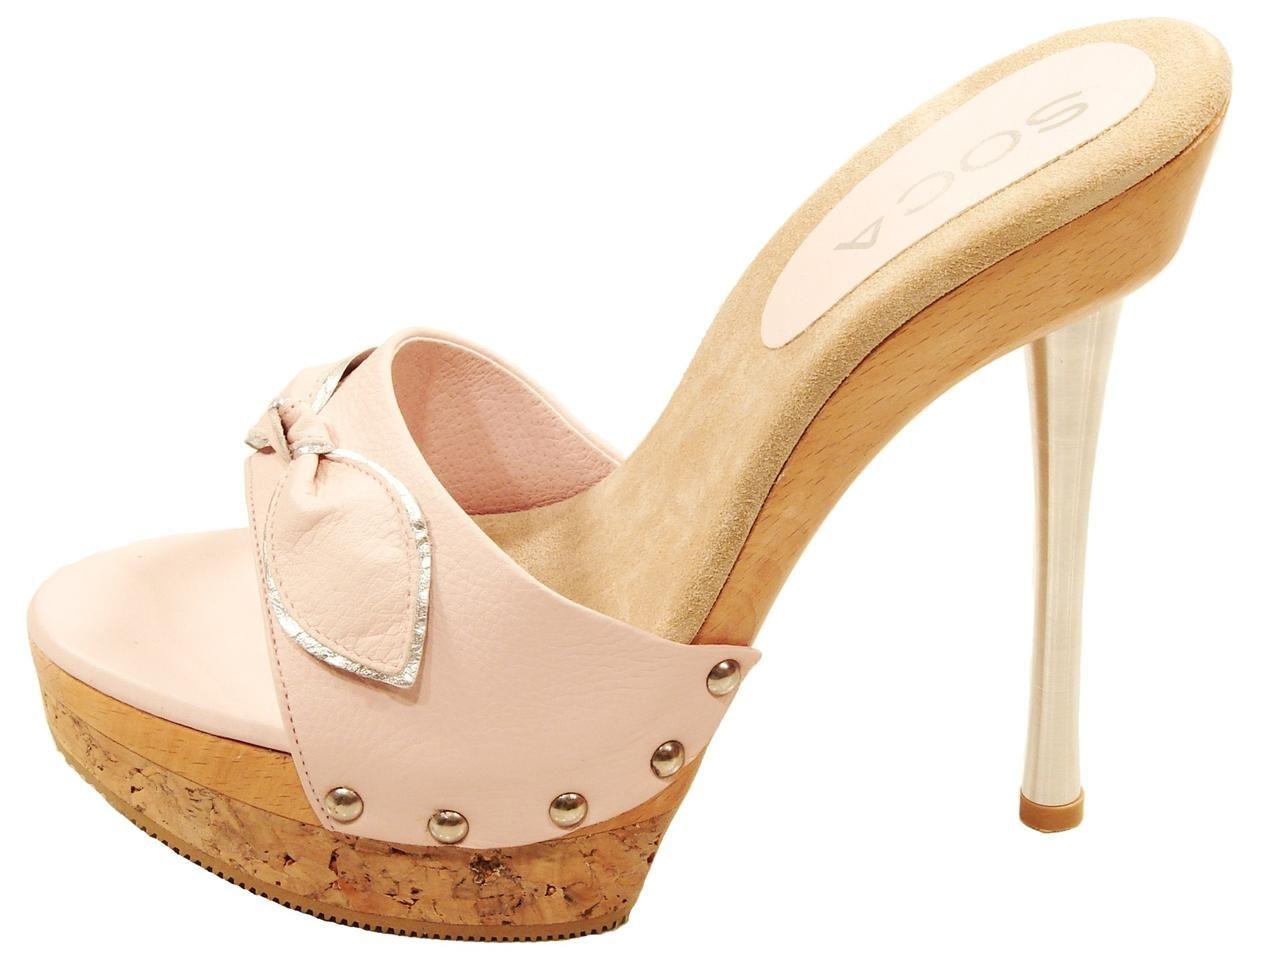 47026afffcd9 Womens soca elsa high heel wood cork platform slides sandals blue ...